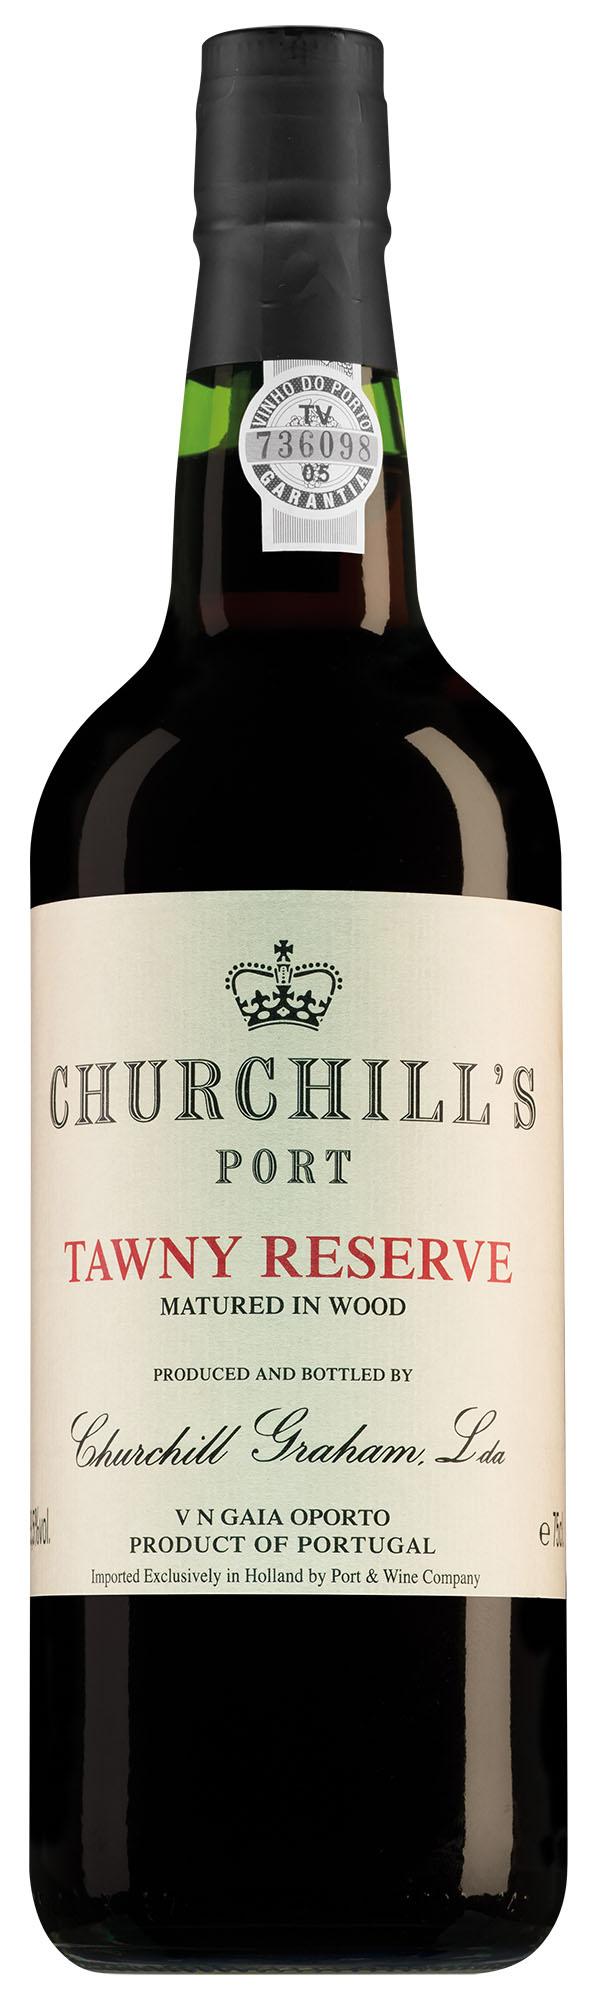 Churchill's Tawny Reserve Port